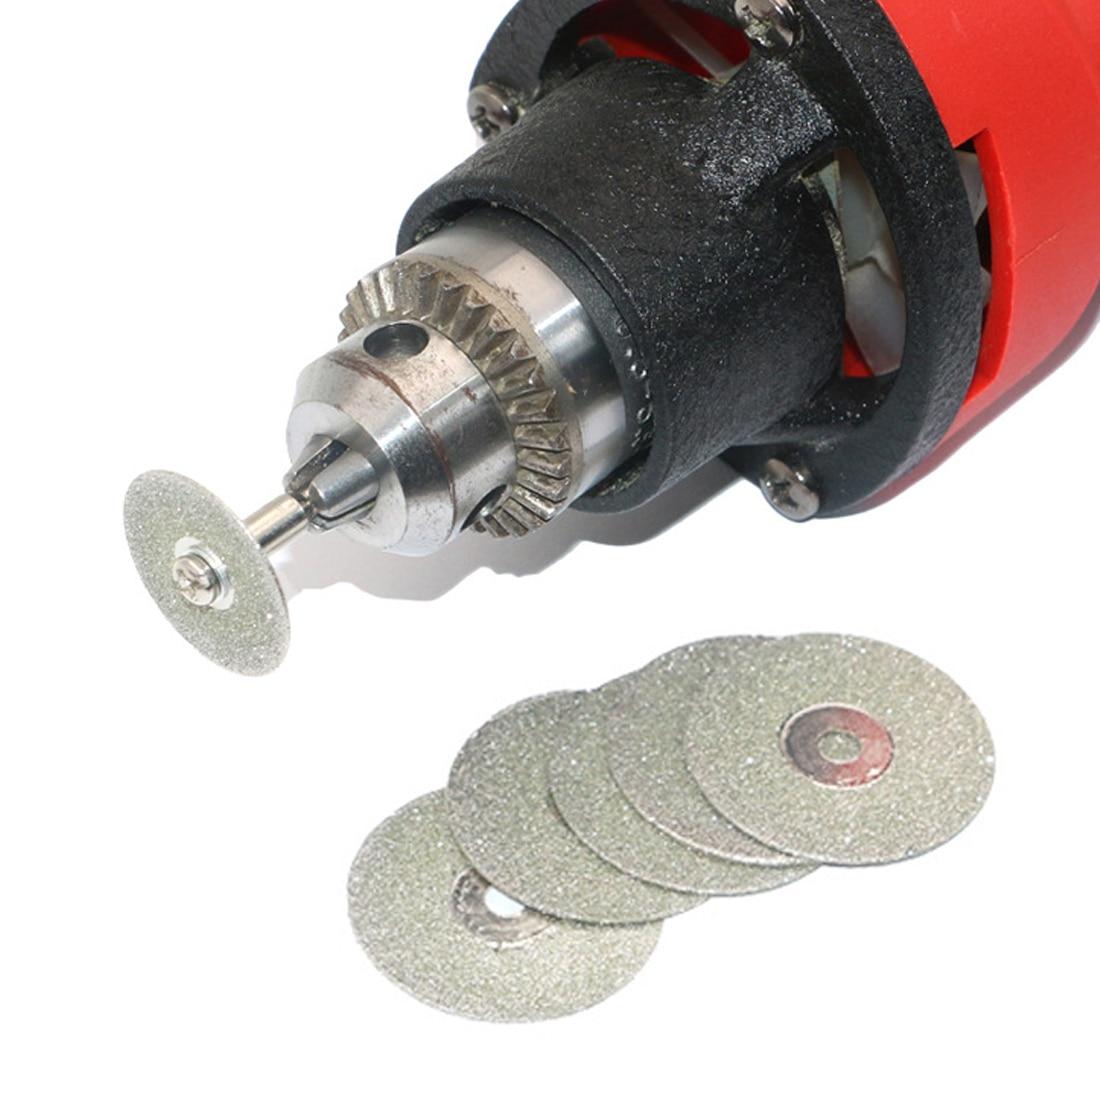 Top Accessories Diamond Grinding Wheel Saw Mini Circular Saw Cutting Disc Rotary Tool Diamond Disc For Dremel Rotary Tools